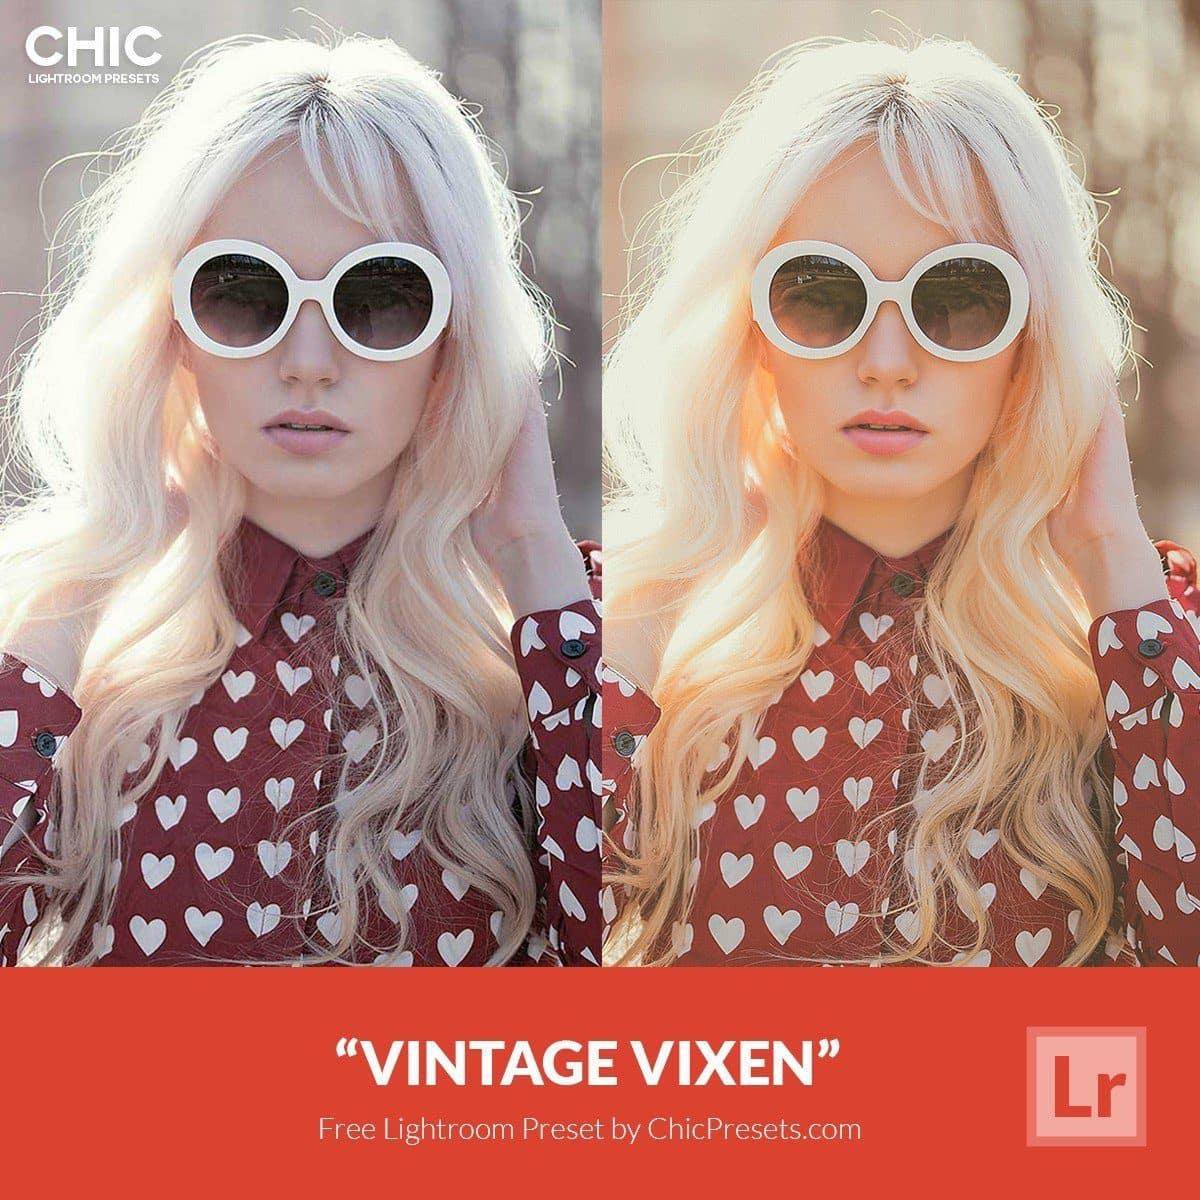 Free-Lightroom-Preset-Vintage-Vixen